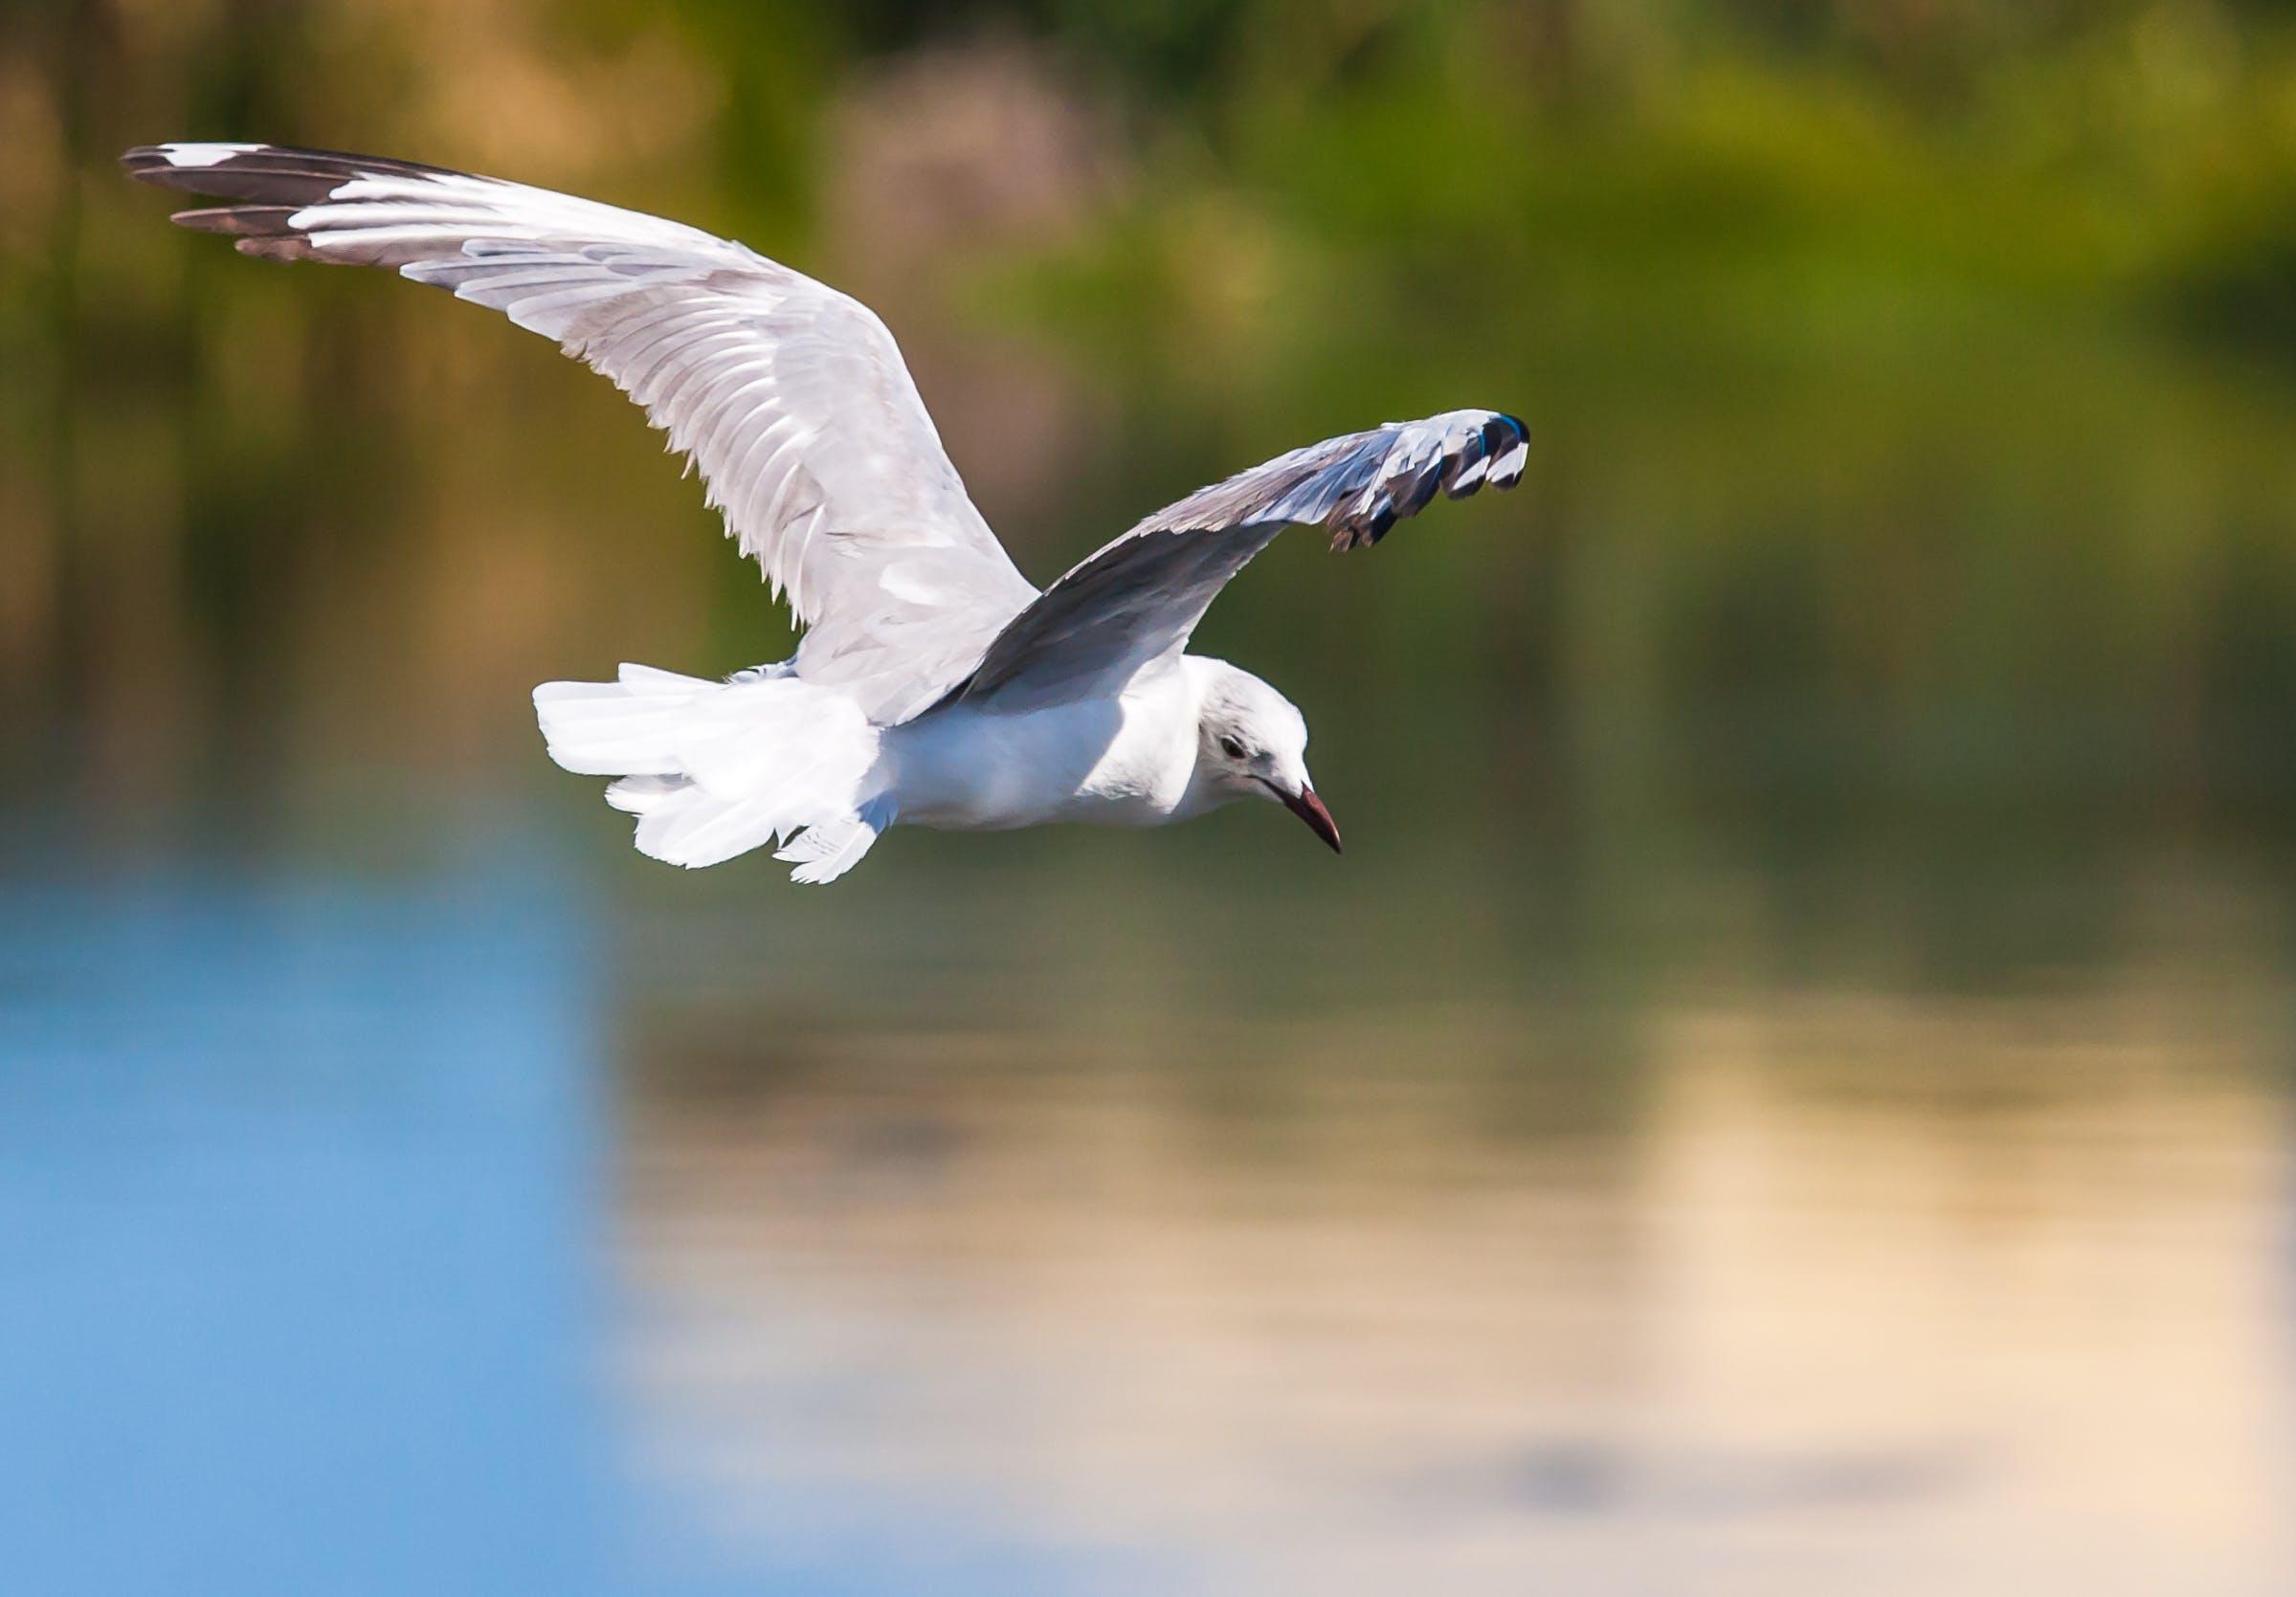 Flying White Bird Above Body of Water